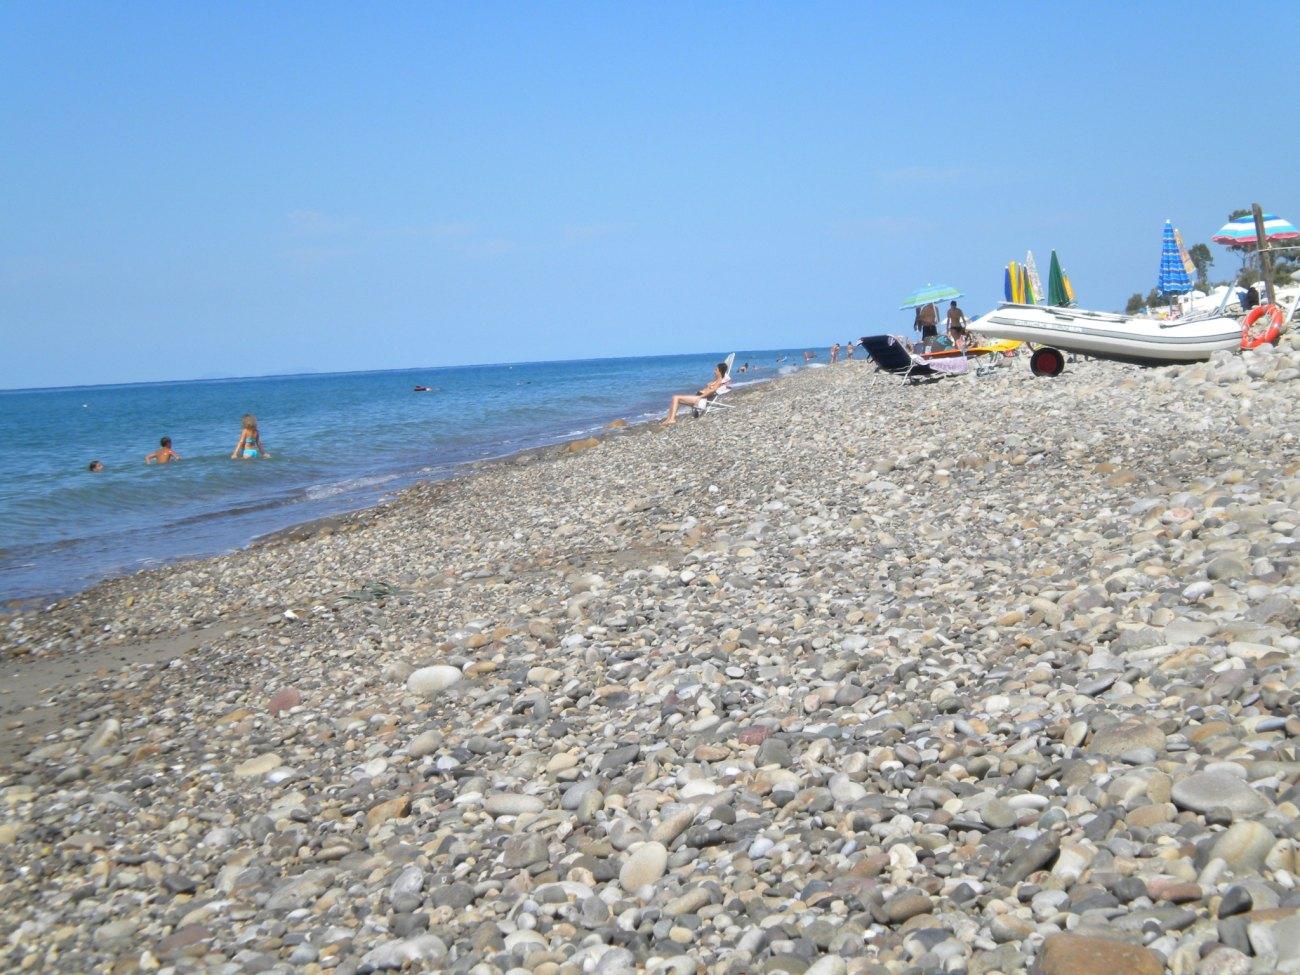 Beach 30 min away from Palermo, Sicily